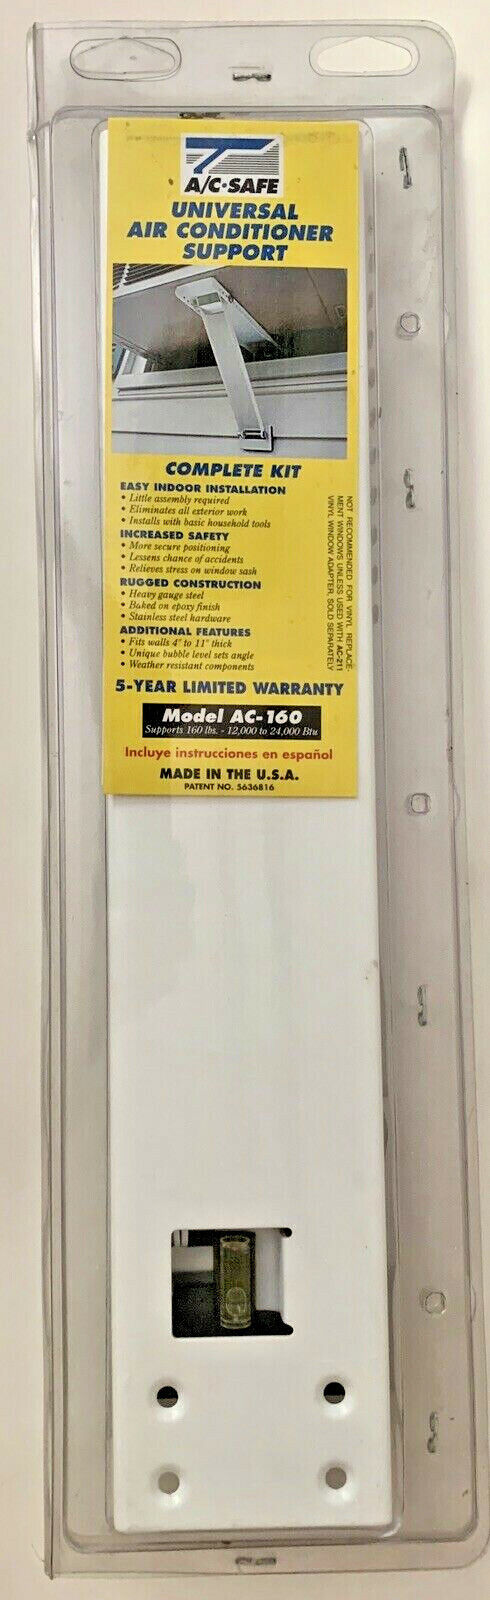 A/C Safe AC-160 Universal Heavy Duty Window Air Conditioner